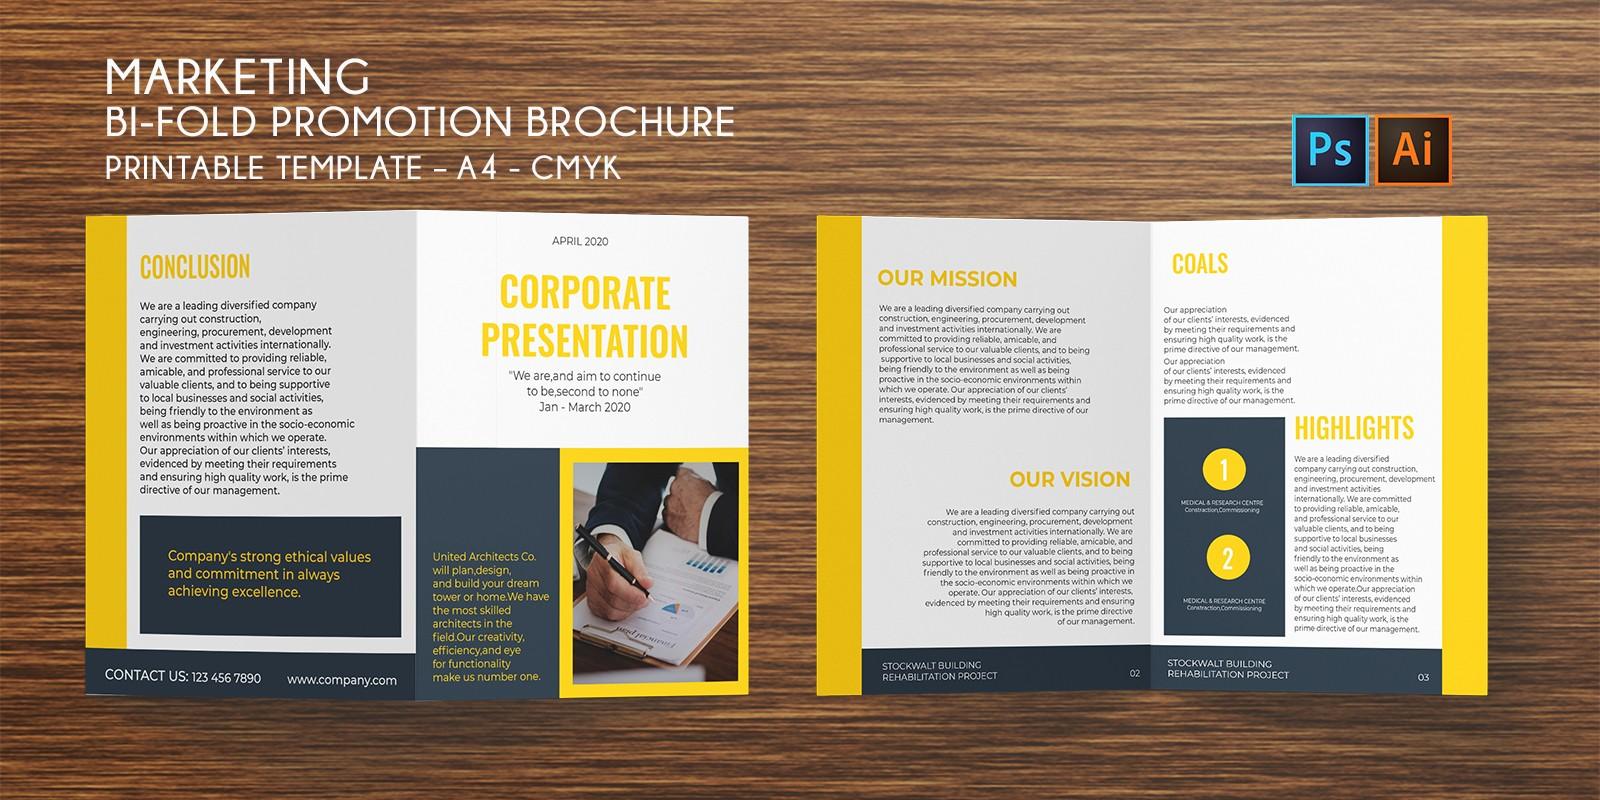 Bi-Fold Marketing Brochure A4  – PSD AI Template